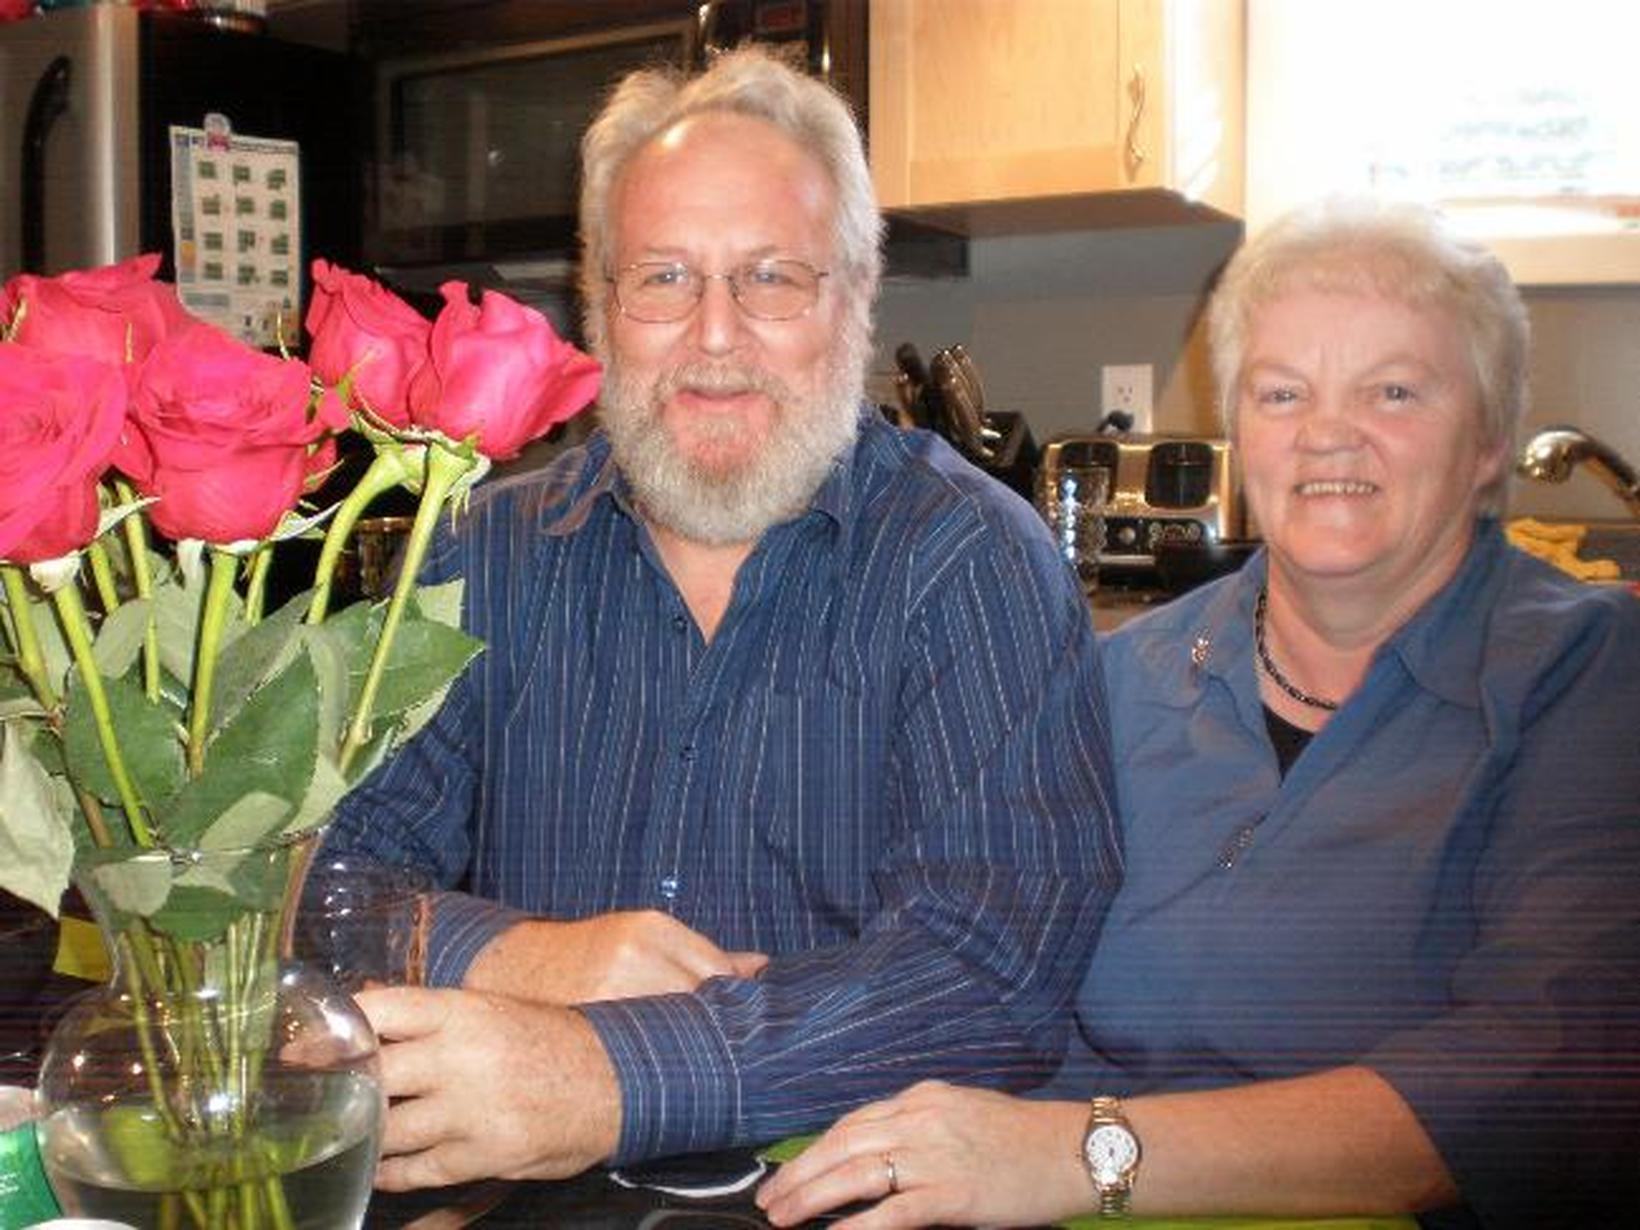 Gordon & Lorna from Whitehorse, Yukon, Canada